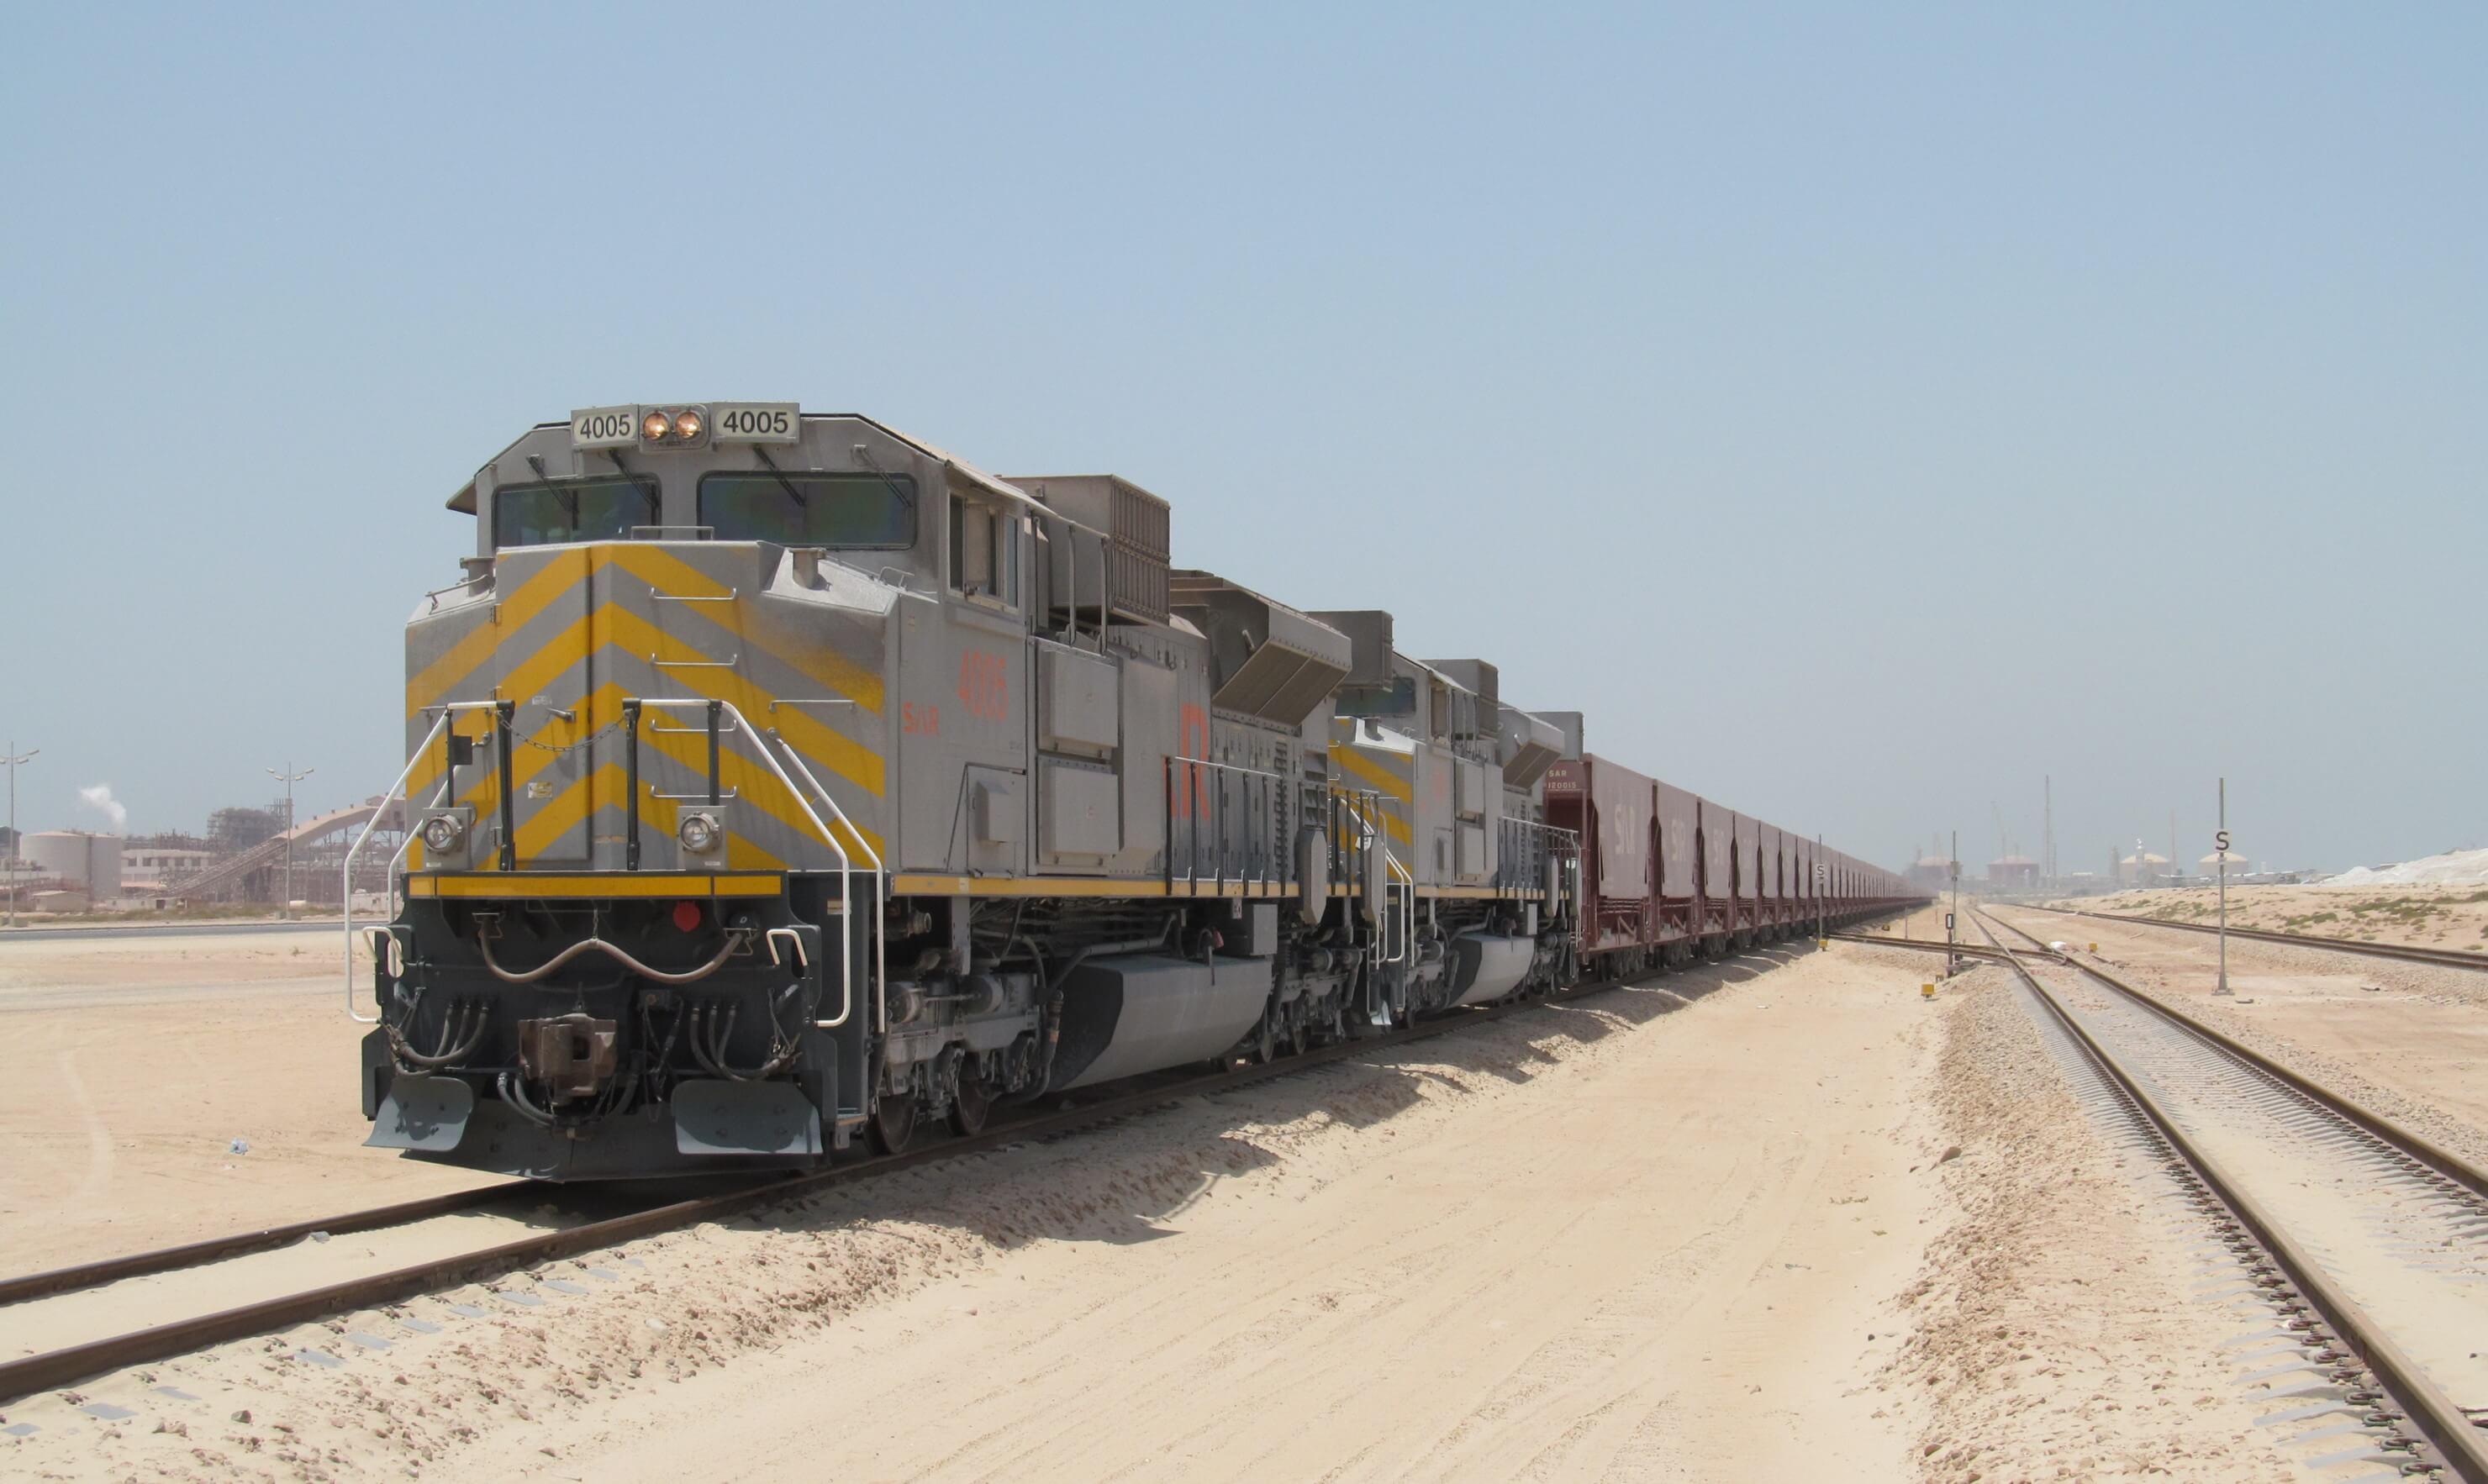 freightliner middle east